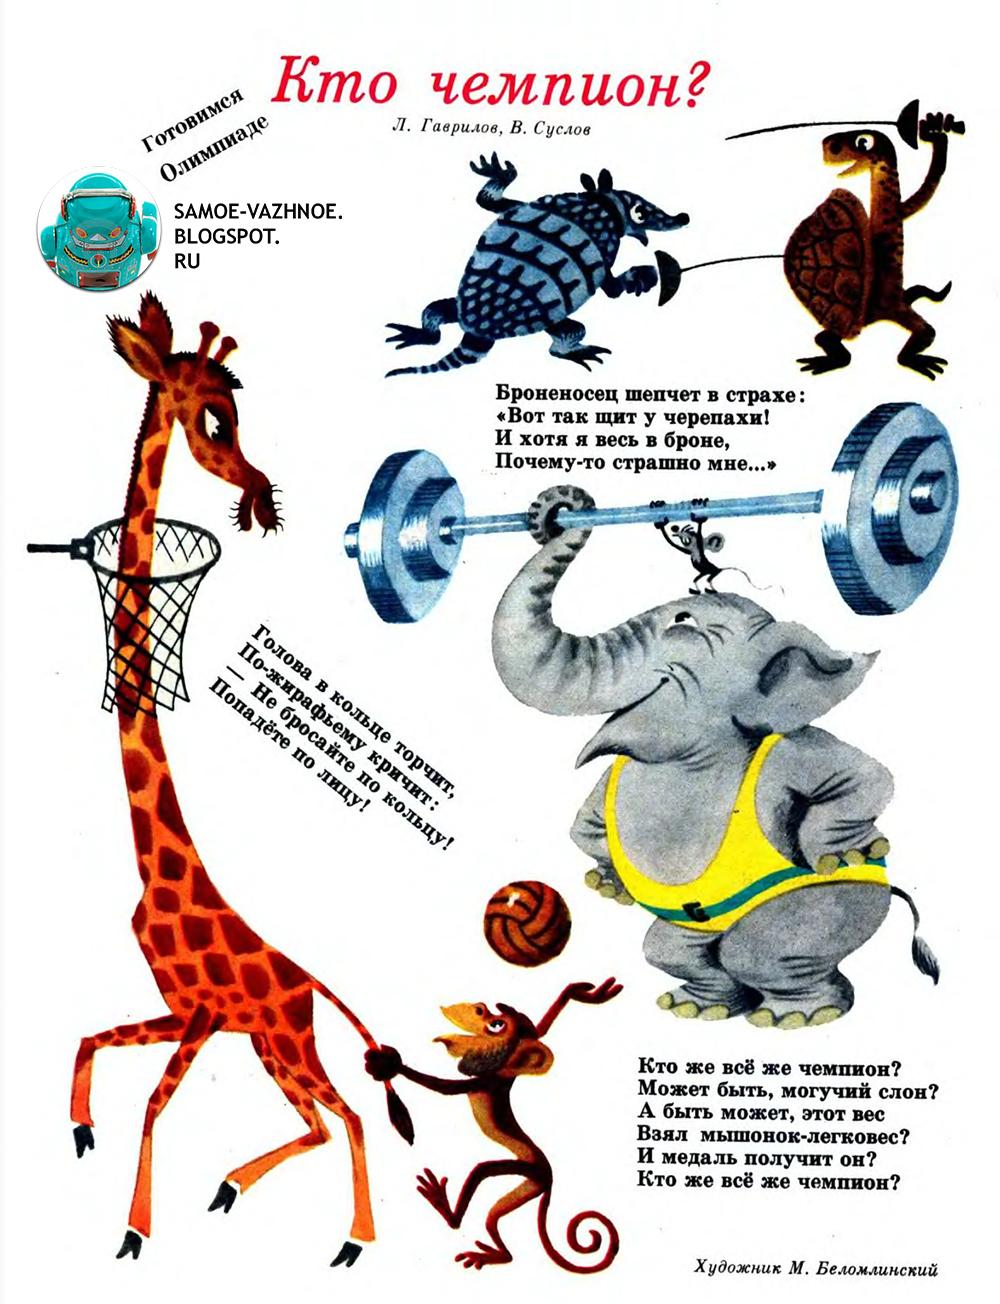 Журнал Весёлые картинки 12 1979 кто чемпион звери спорт